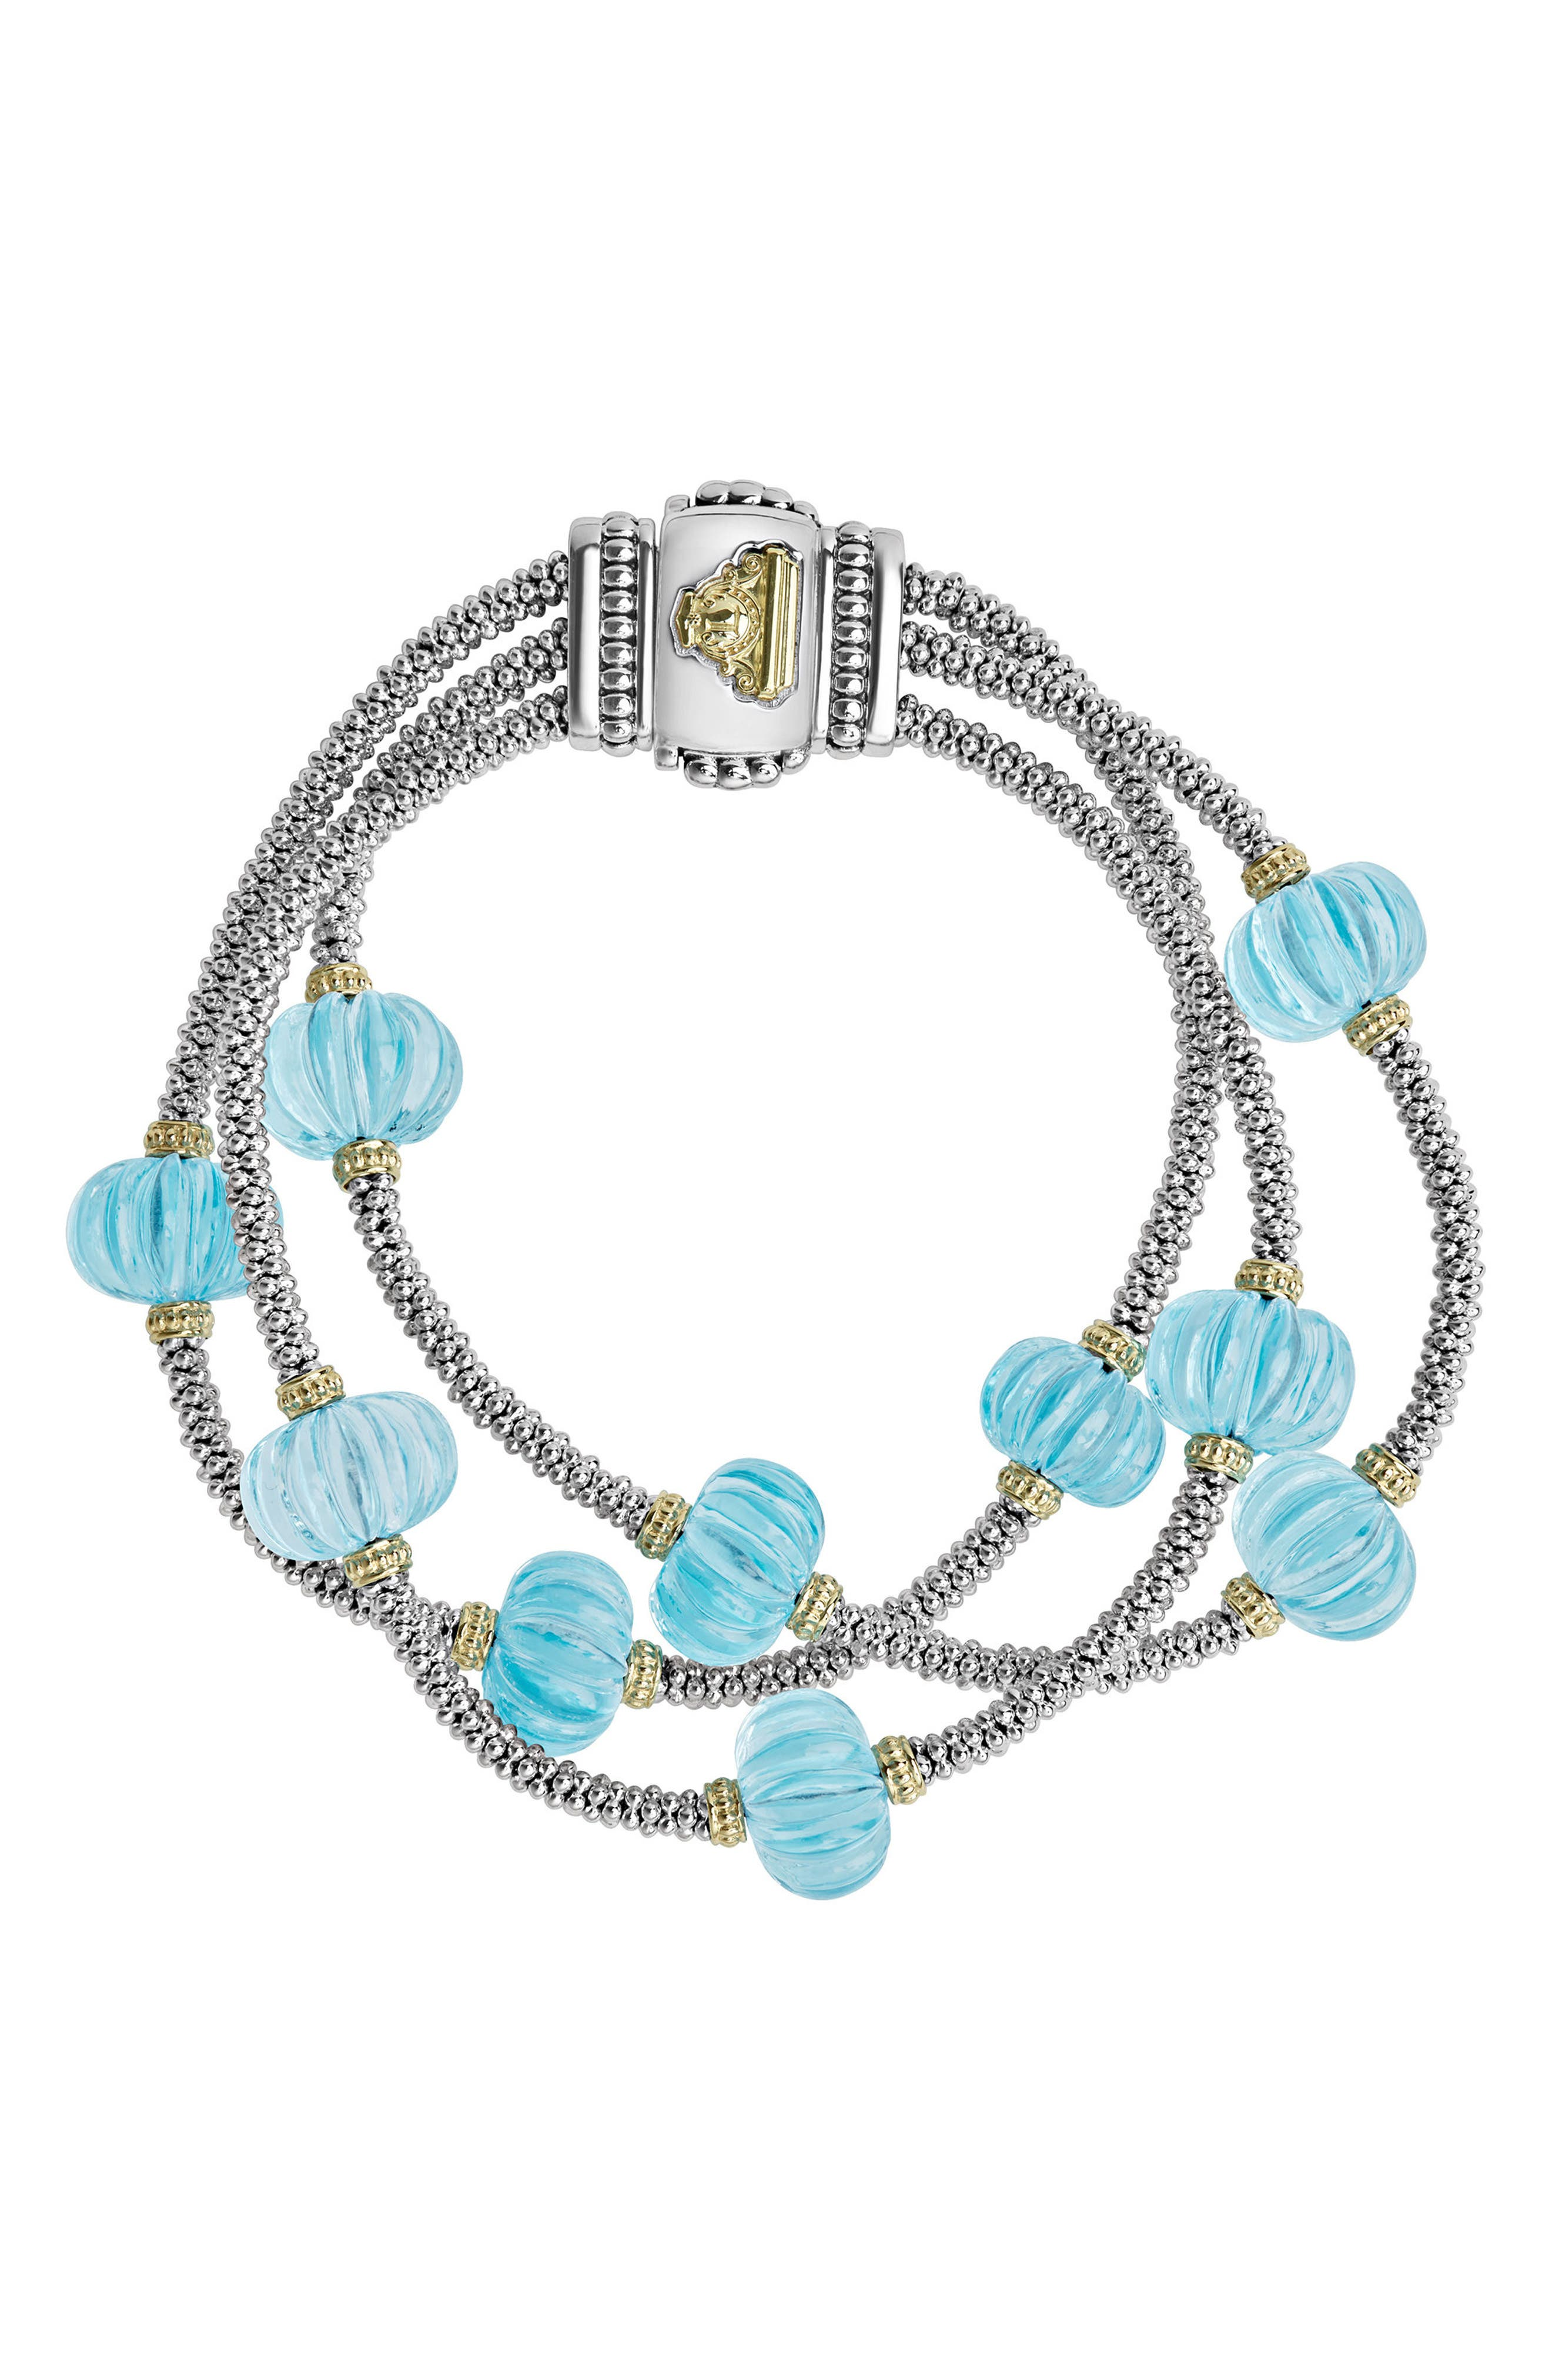 Caviar Forever Triple Strand Melon Bead Bracelet,                             Main thumbnail 1, color,                             Silver/ Sky Blue Topaz